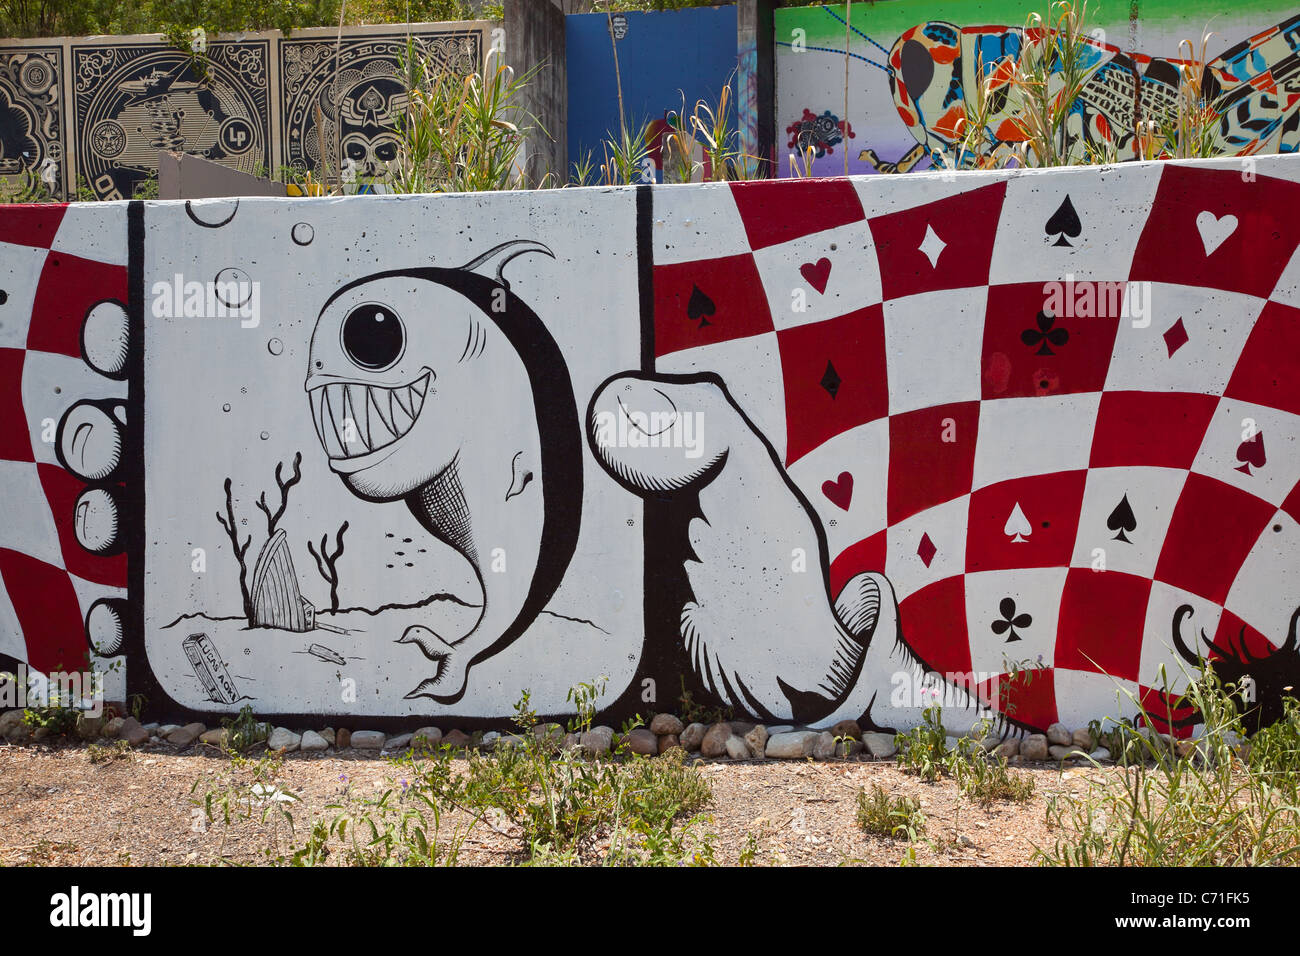 Graffiti wall austin - Graffiti Art On Castle Hill In Austin Texas On Concrete Foundation Walls